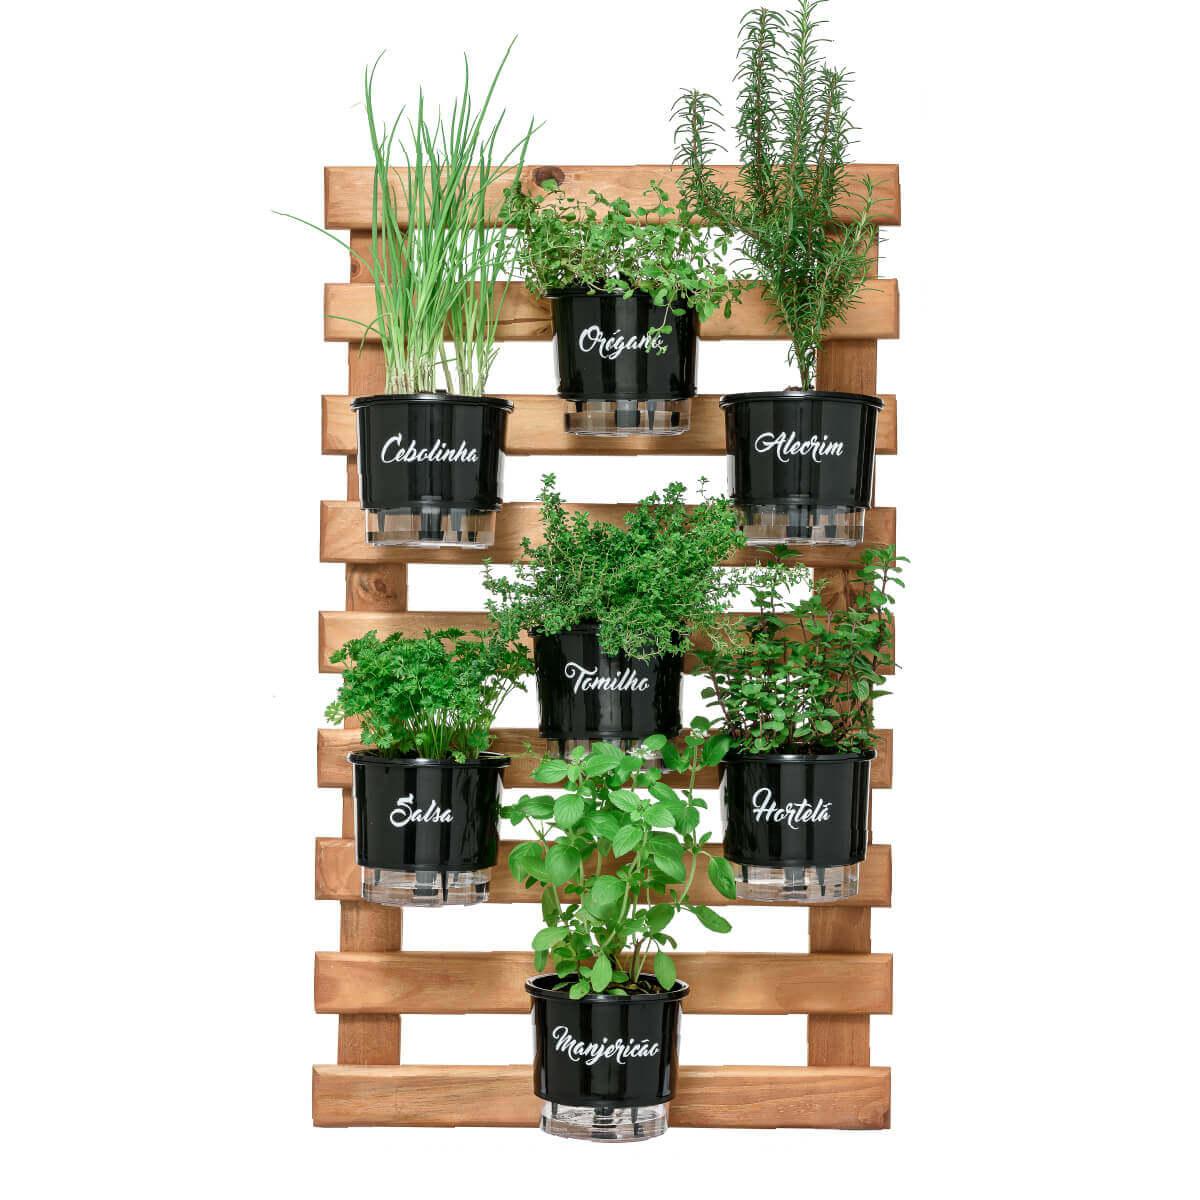 Horta Vertical Caramelo 60cm x 100cm com 7 Vasos Gourmet  - Loja Raiz